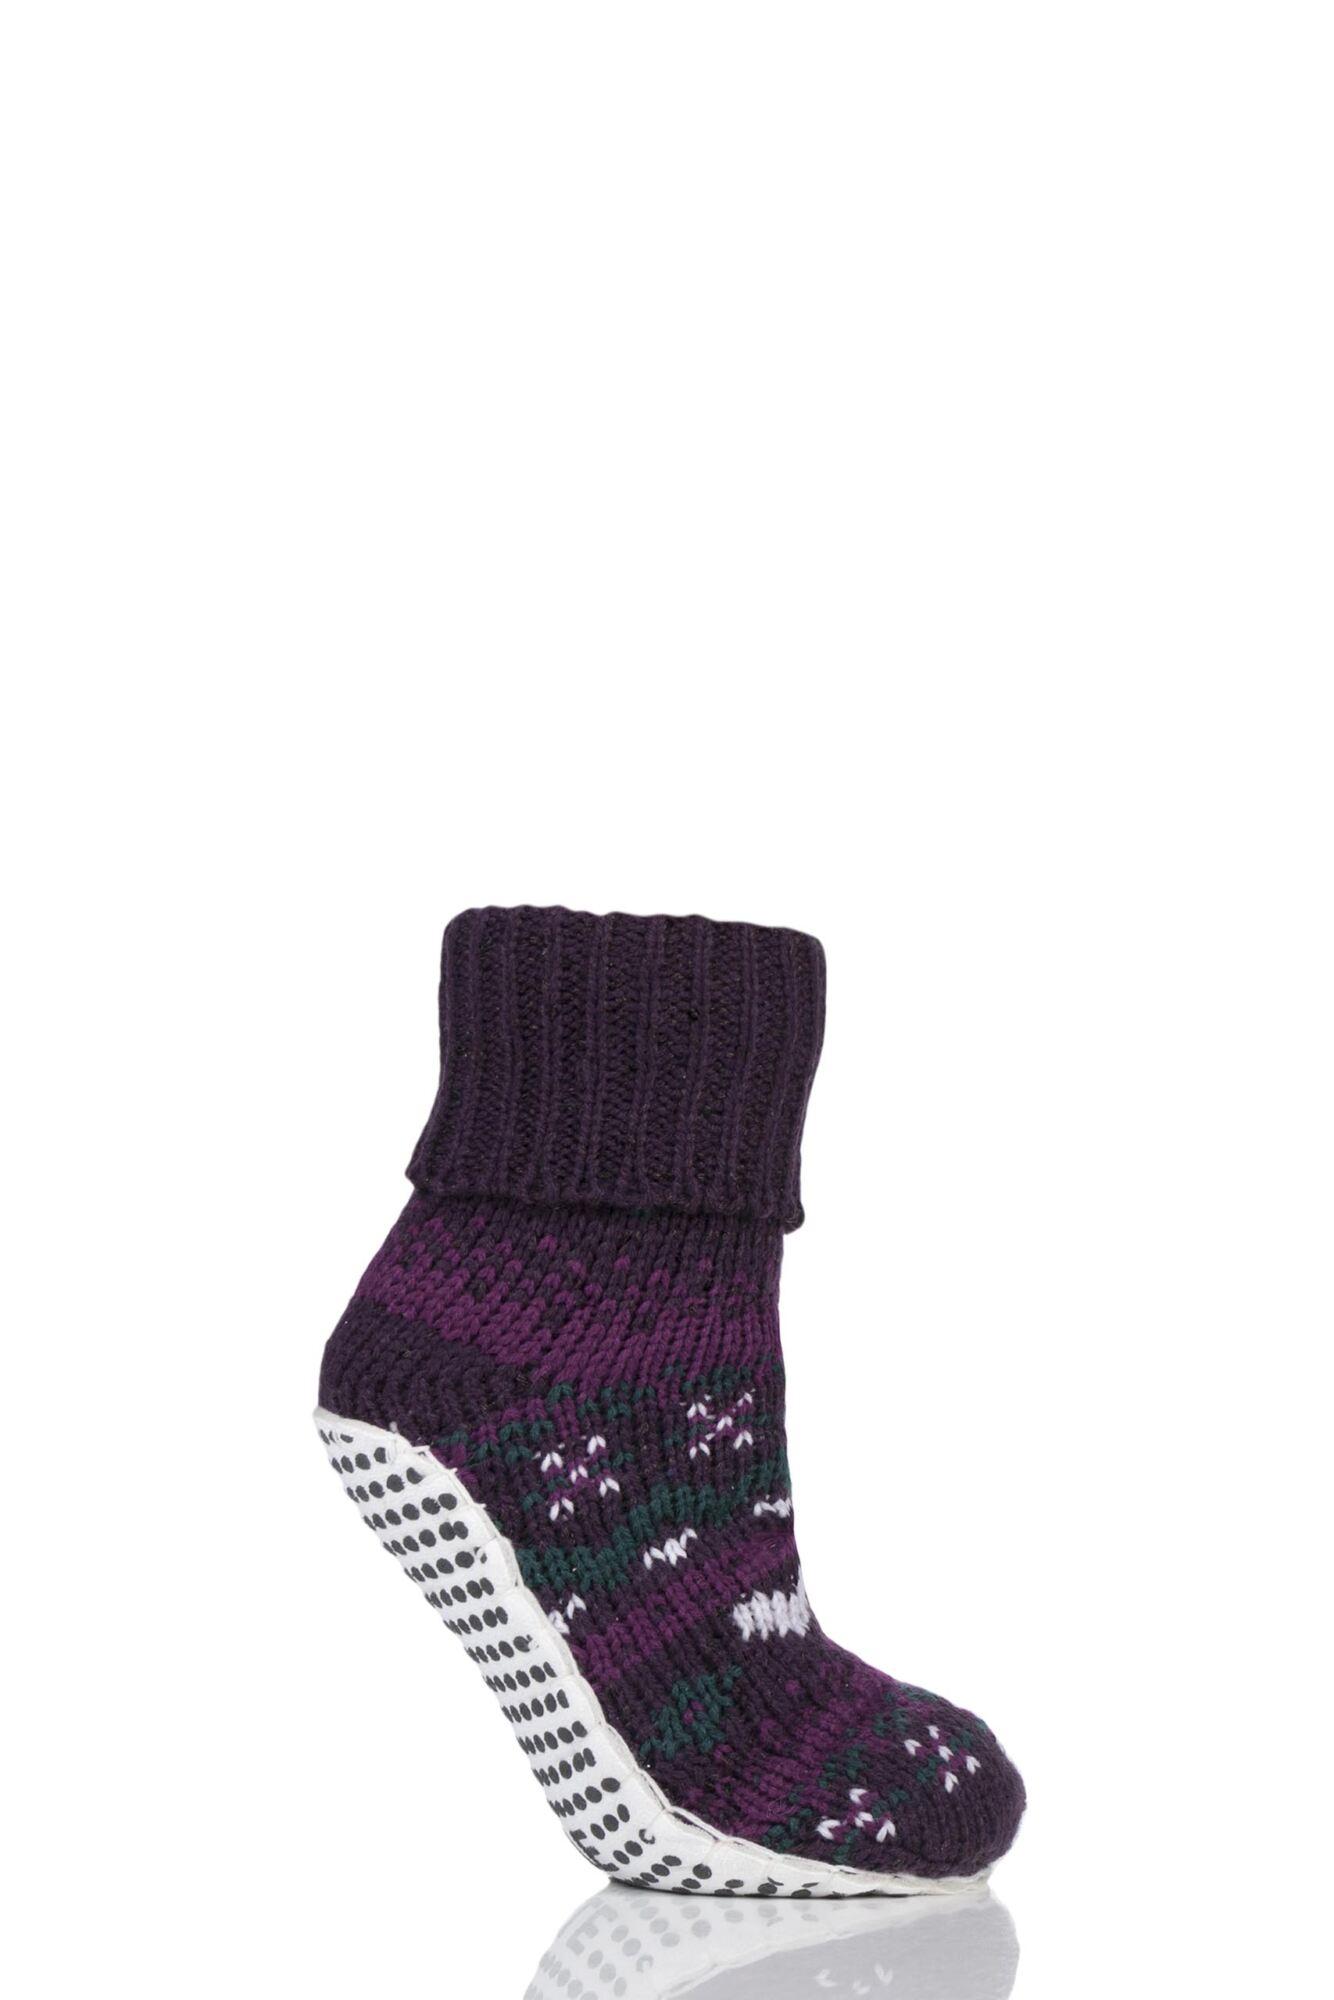 1 Pair Chunky Fair Isle Moccasin Grip Socks Ladies - Elle